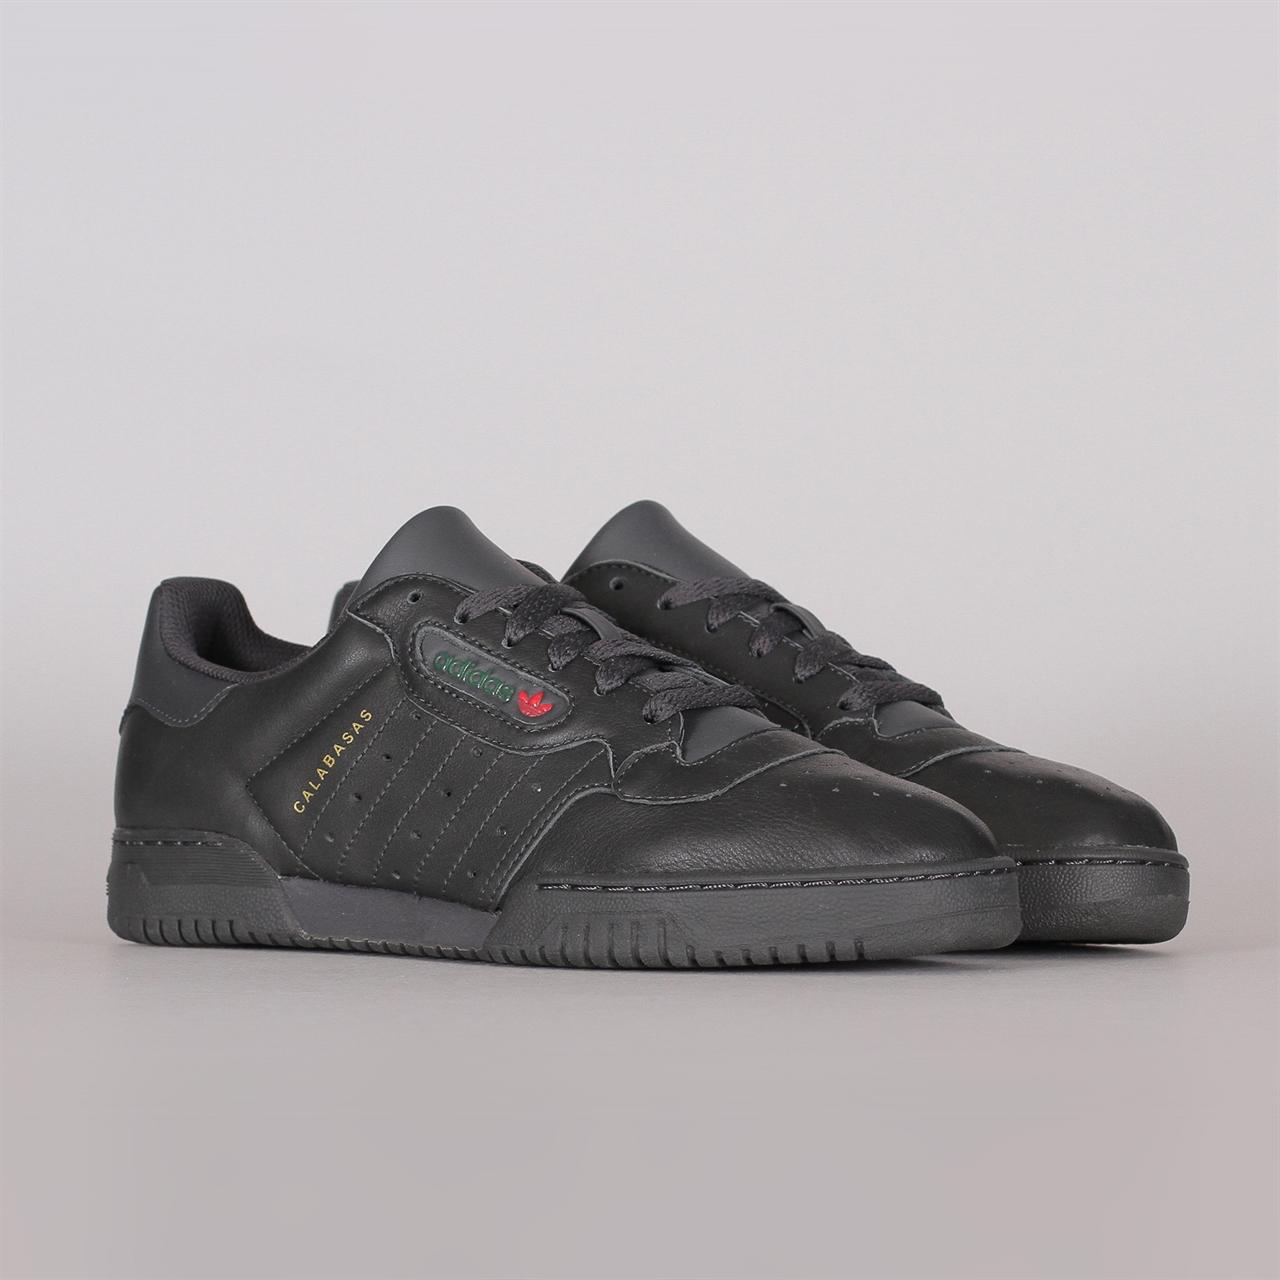 8884aed42404 Shelta - Adidas Originals Yeezy Powerphase (CG6420)